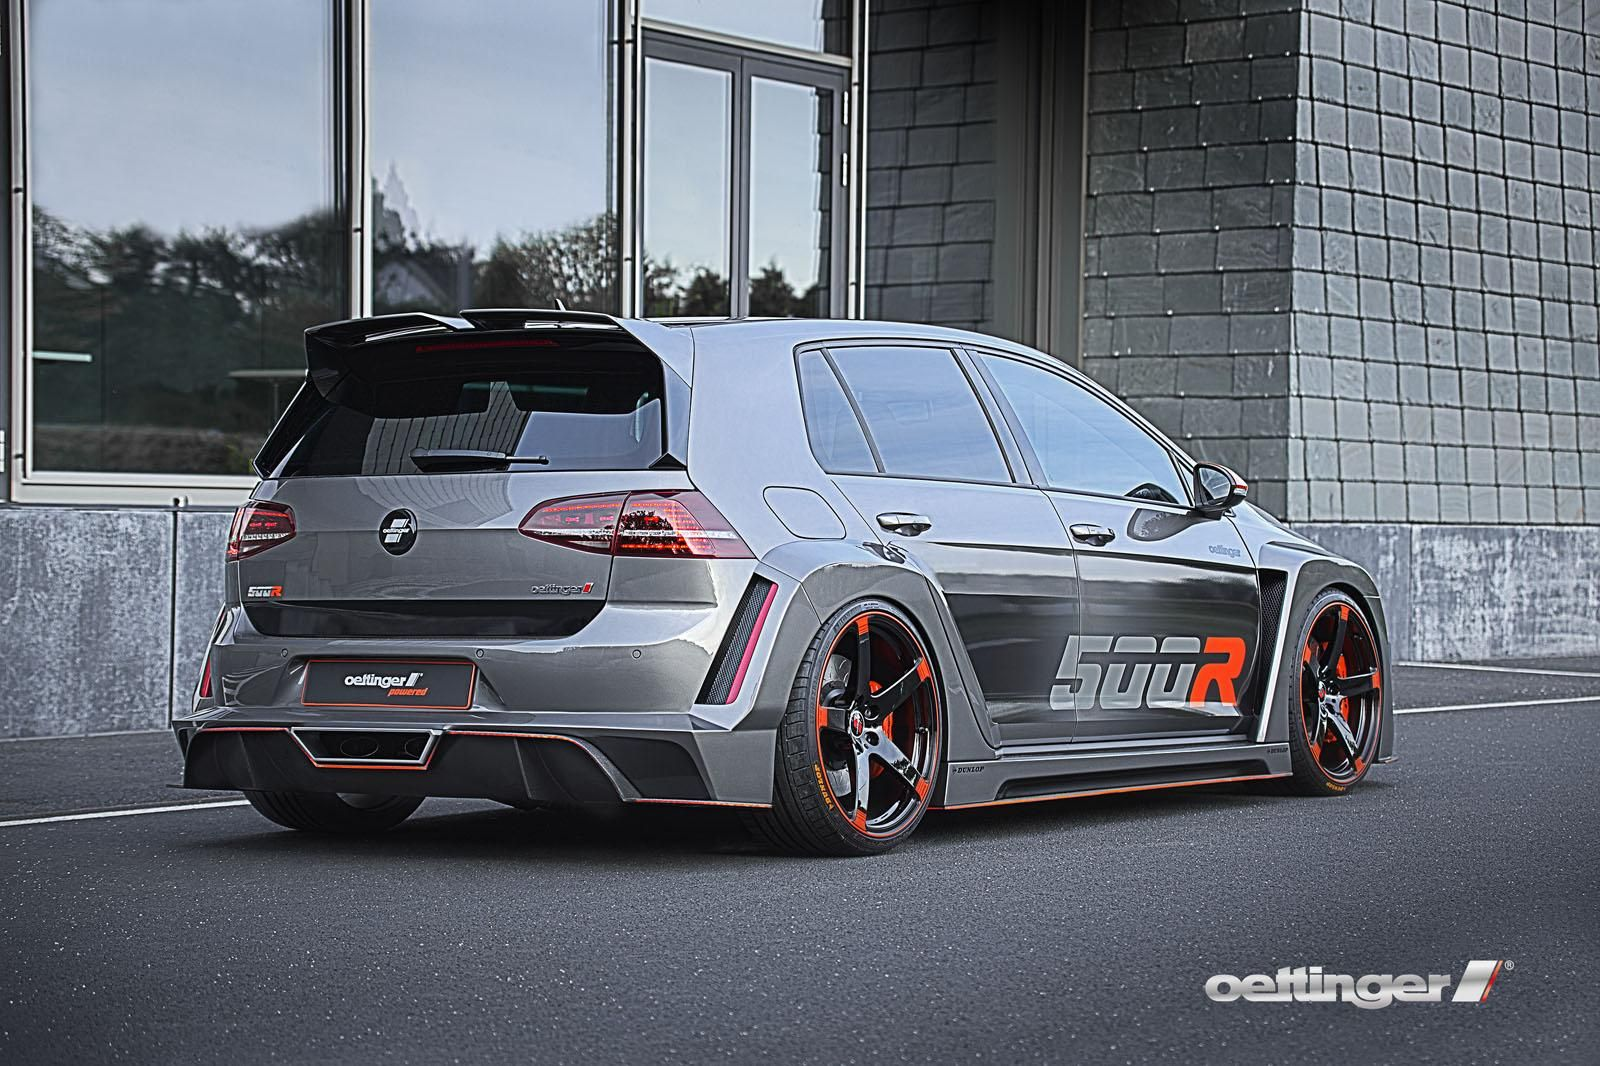 Oettinger Vw Golf R500 With 518 Ps Carros Carros De Luxo Volkswagen Golf